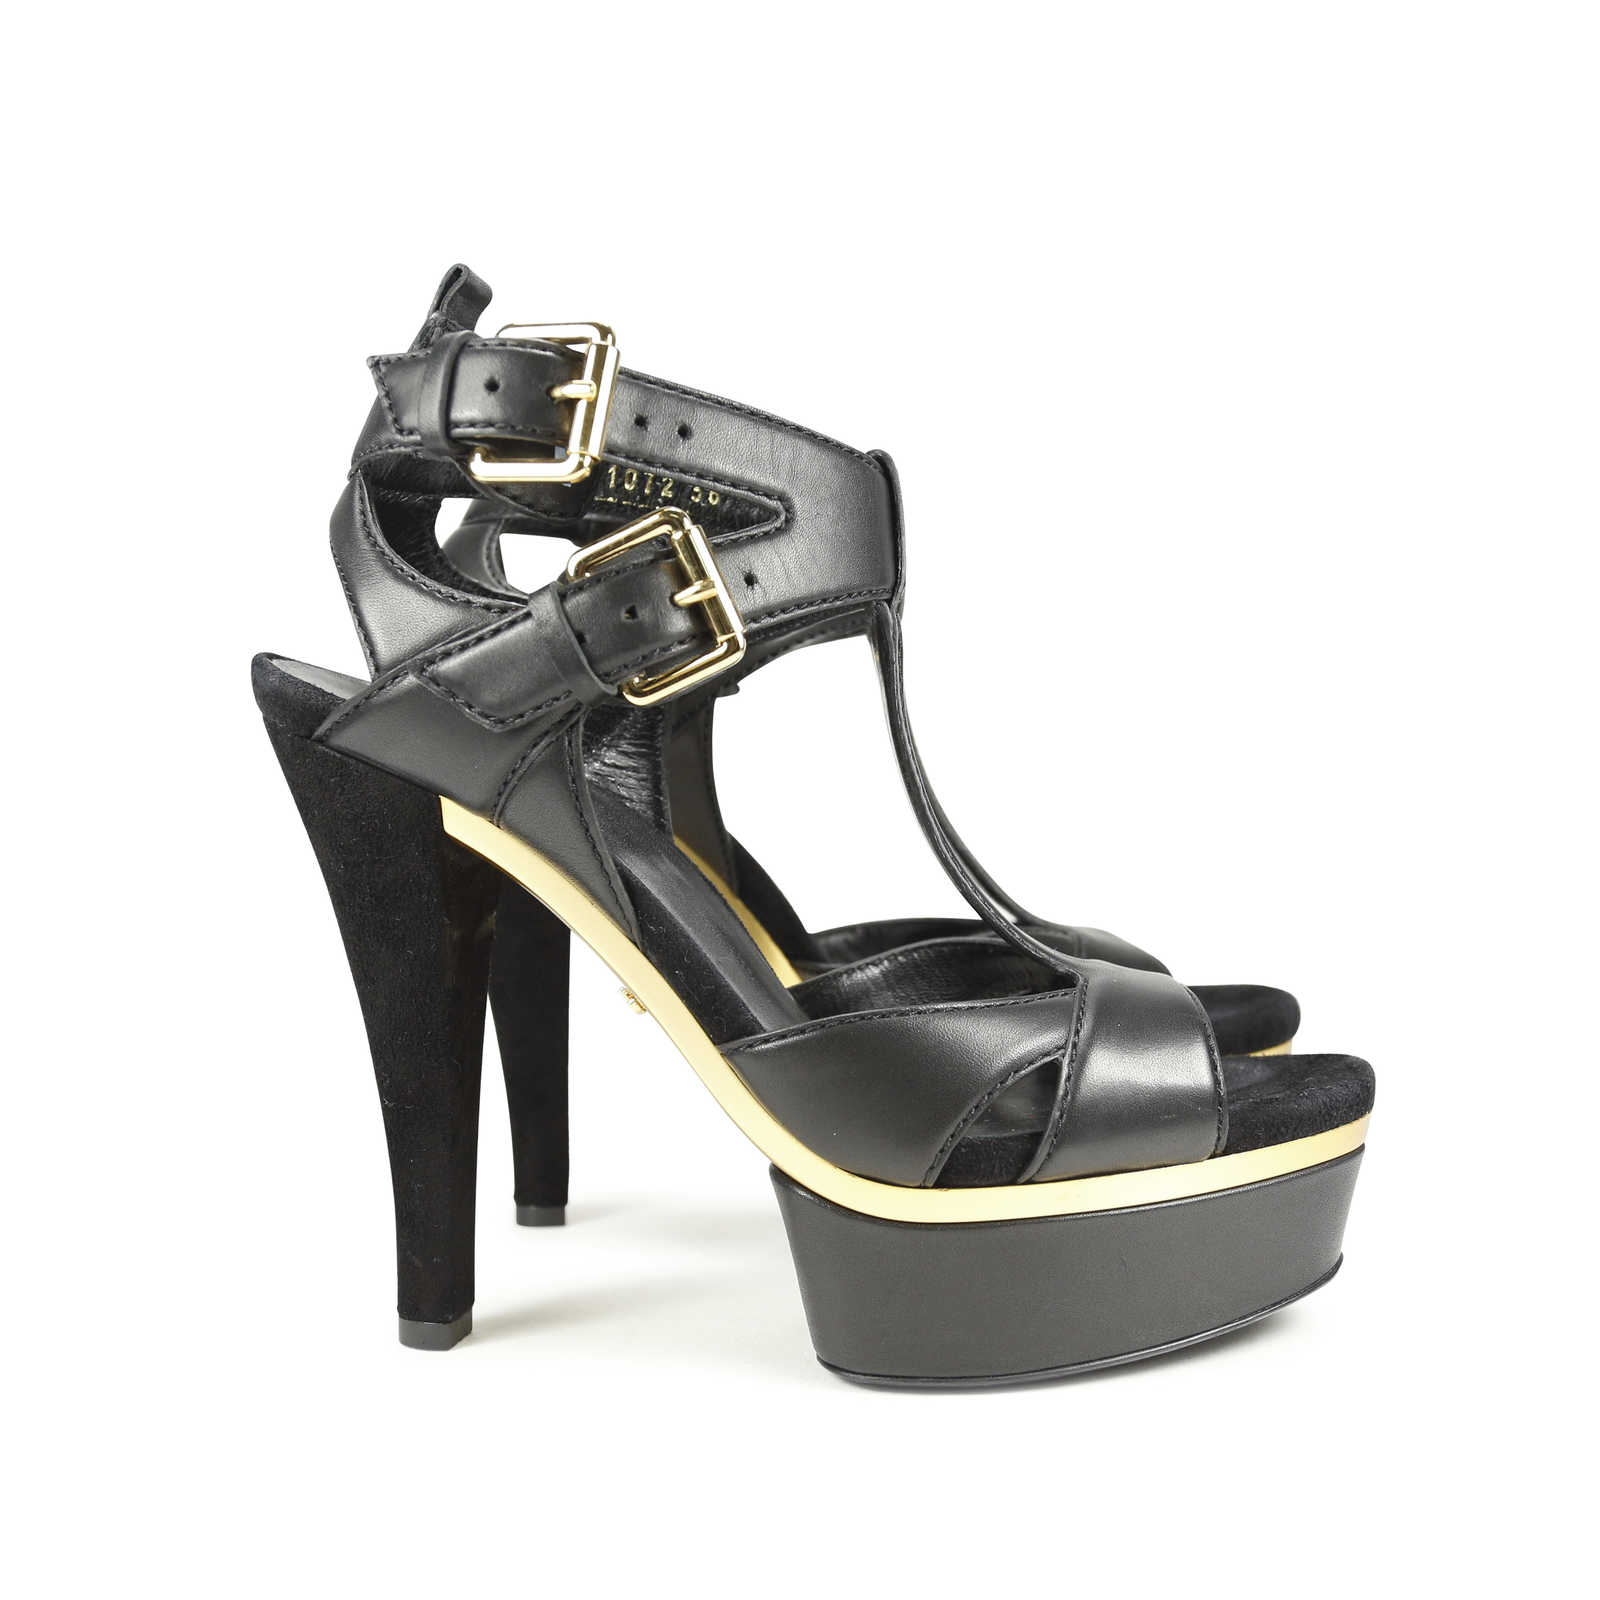 57afd6e47d0424 ... Authentic Second Hand Gucci Iman T-Strap Sandals (PSS-183-00030)